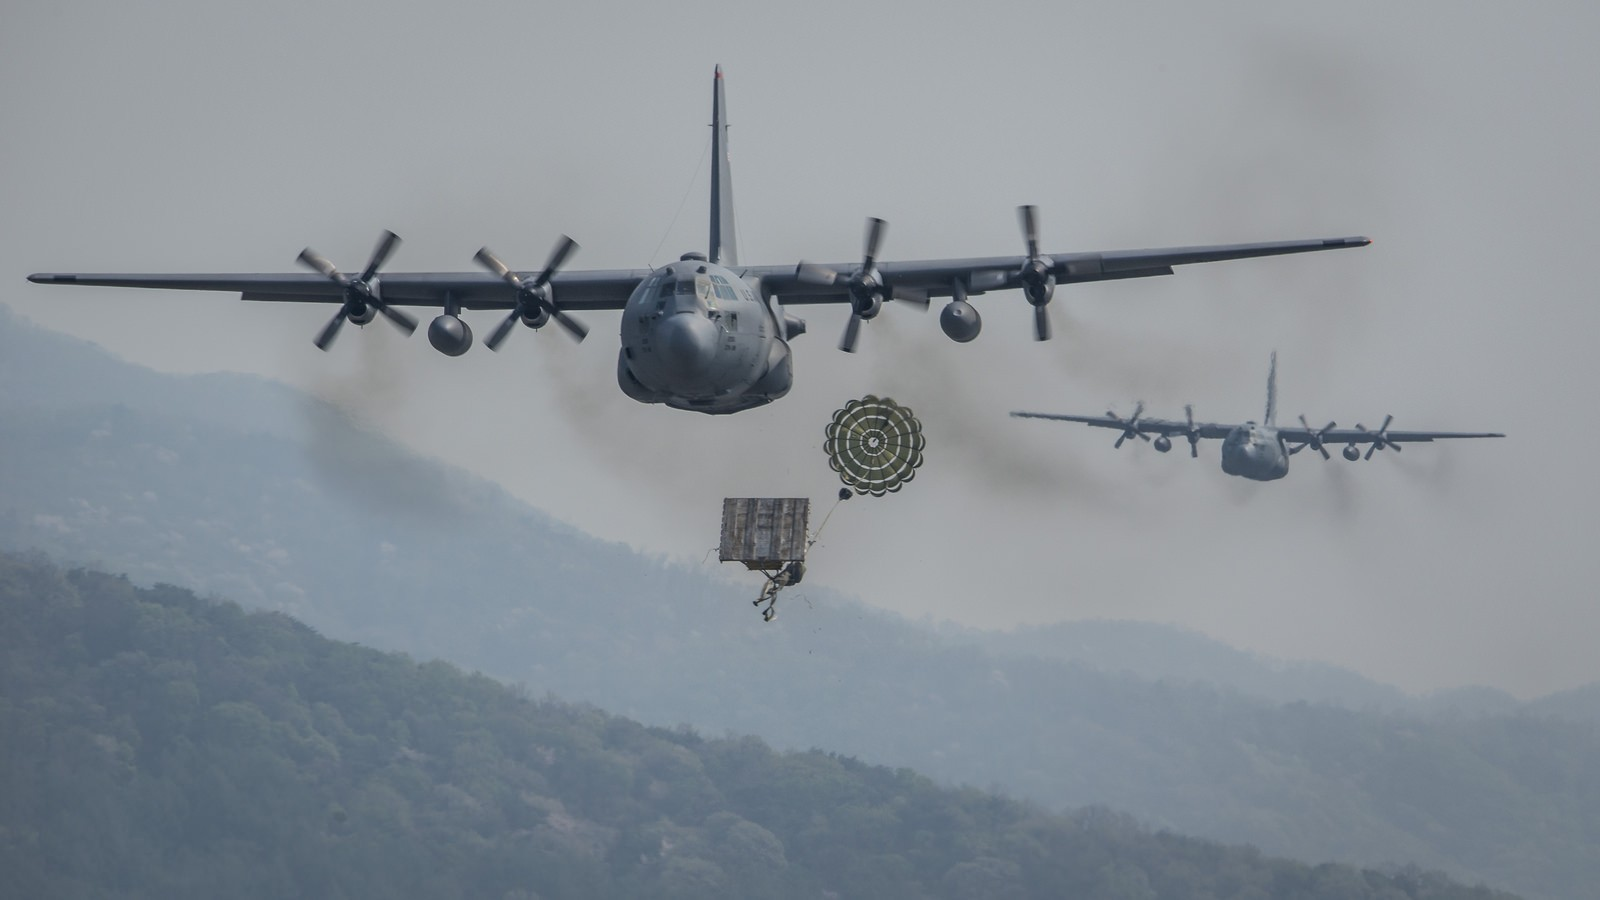 C-130H 수송기의 엔진 업그레이드를 인증한 미 공군